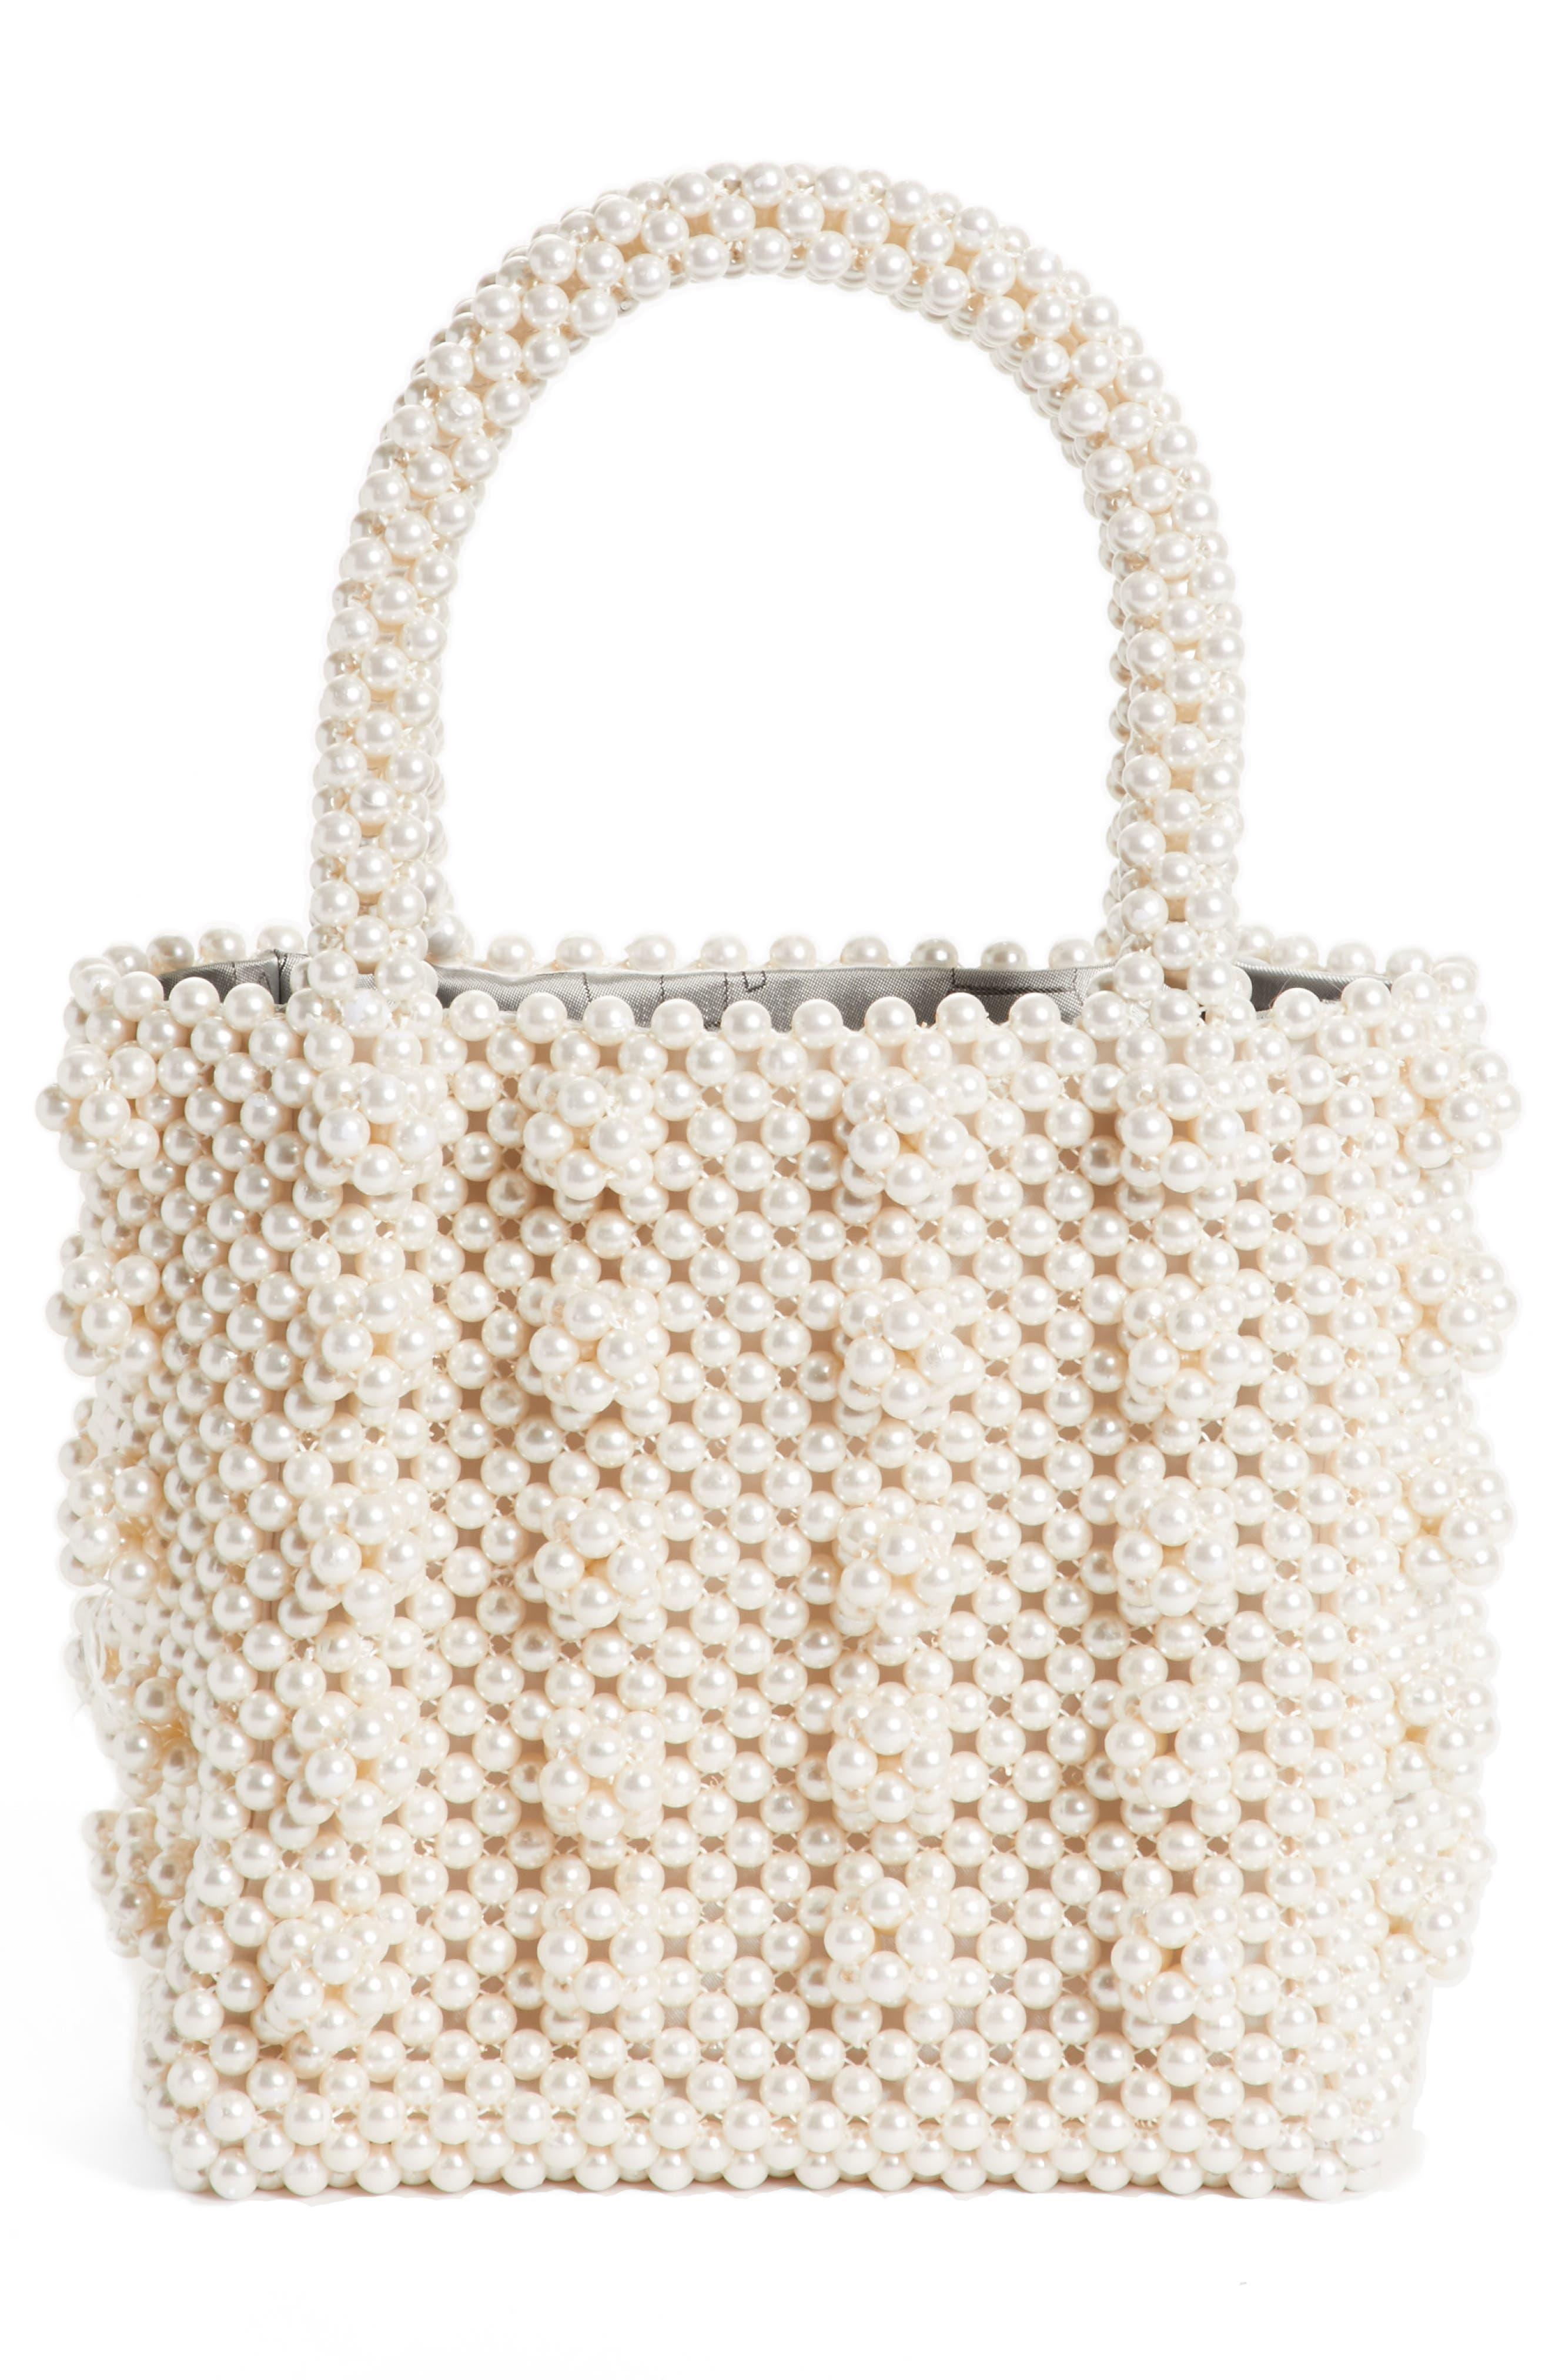 Antonia Small Imitation Pearl Beaded Handbag,                             Alternate thumbnail 3, color,                             900